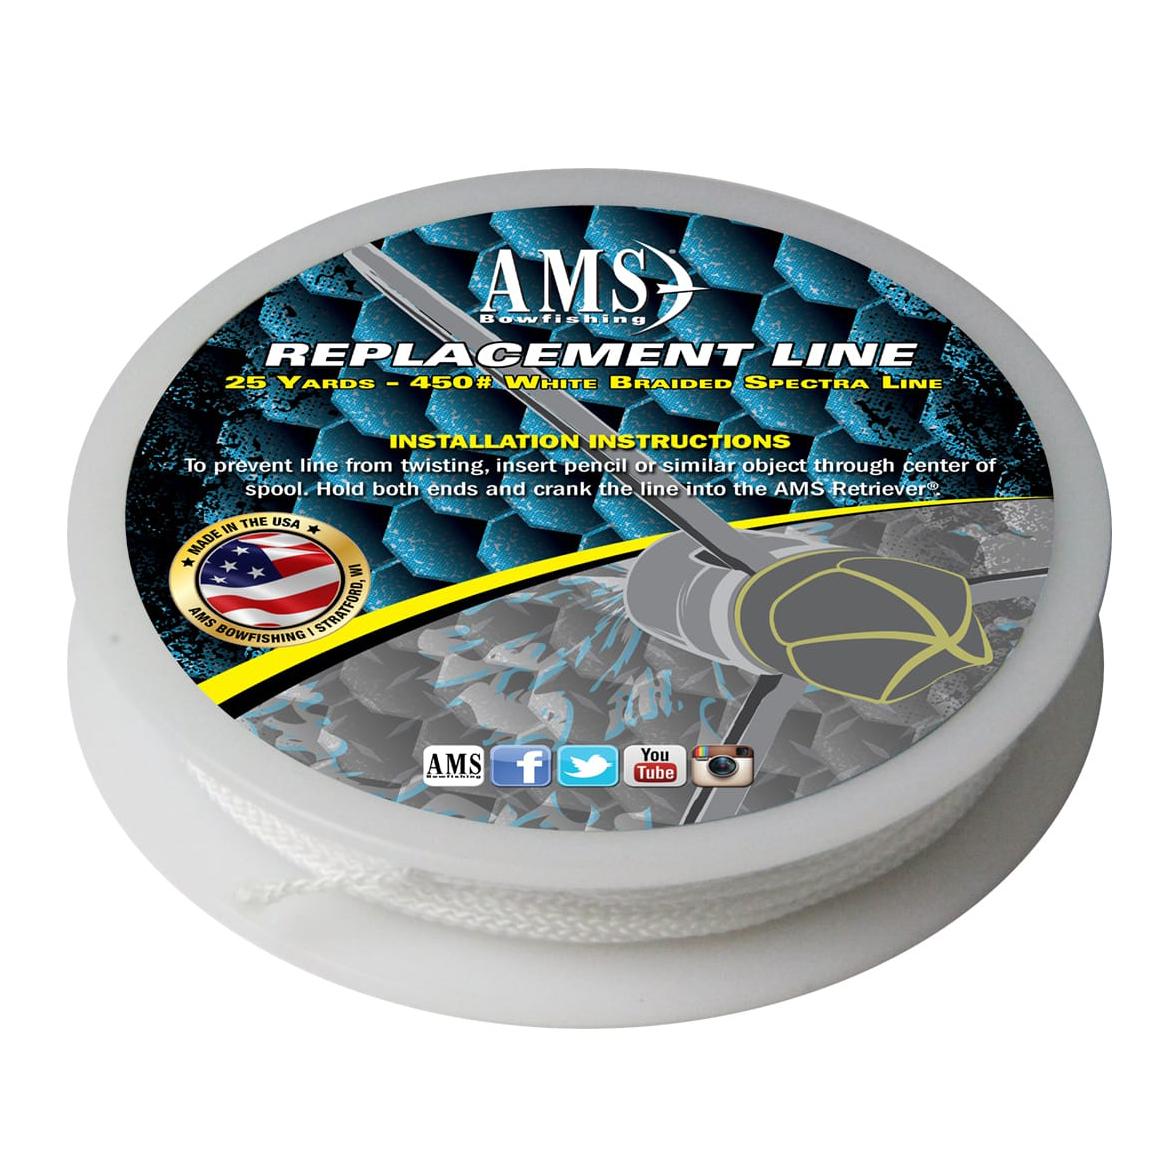 AMS Bowfishing Replacement Bowfishing Line, 450-lb, 25 Yards